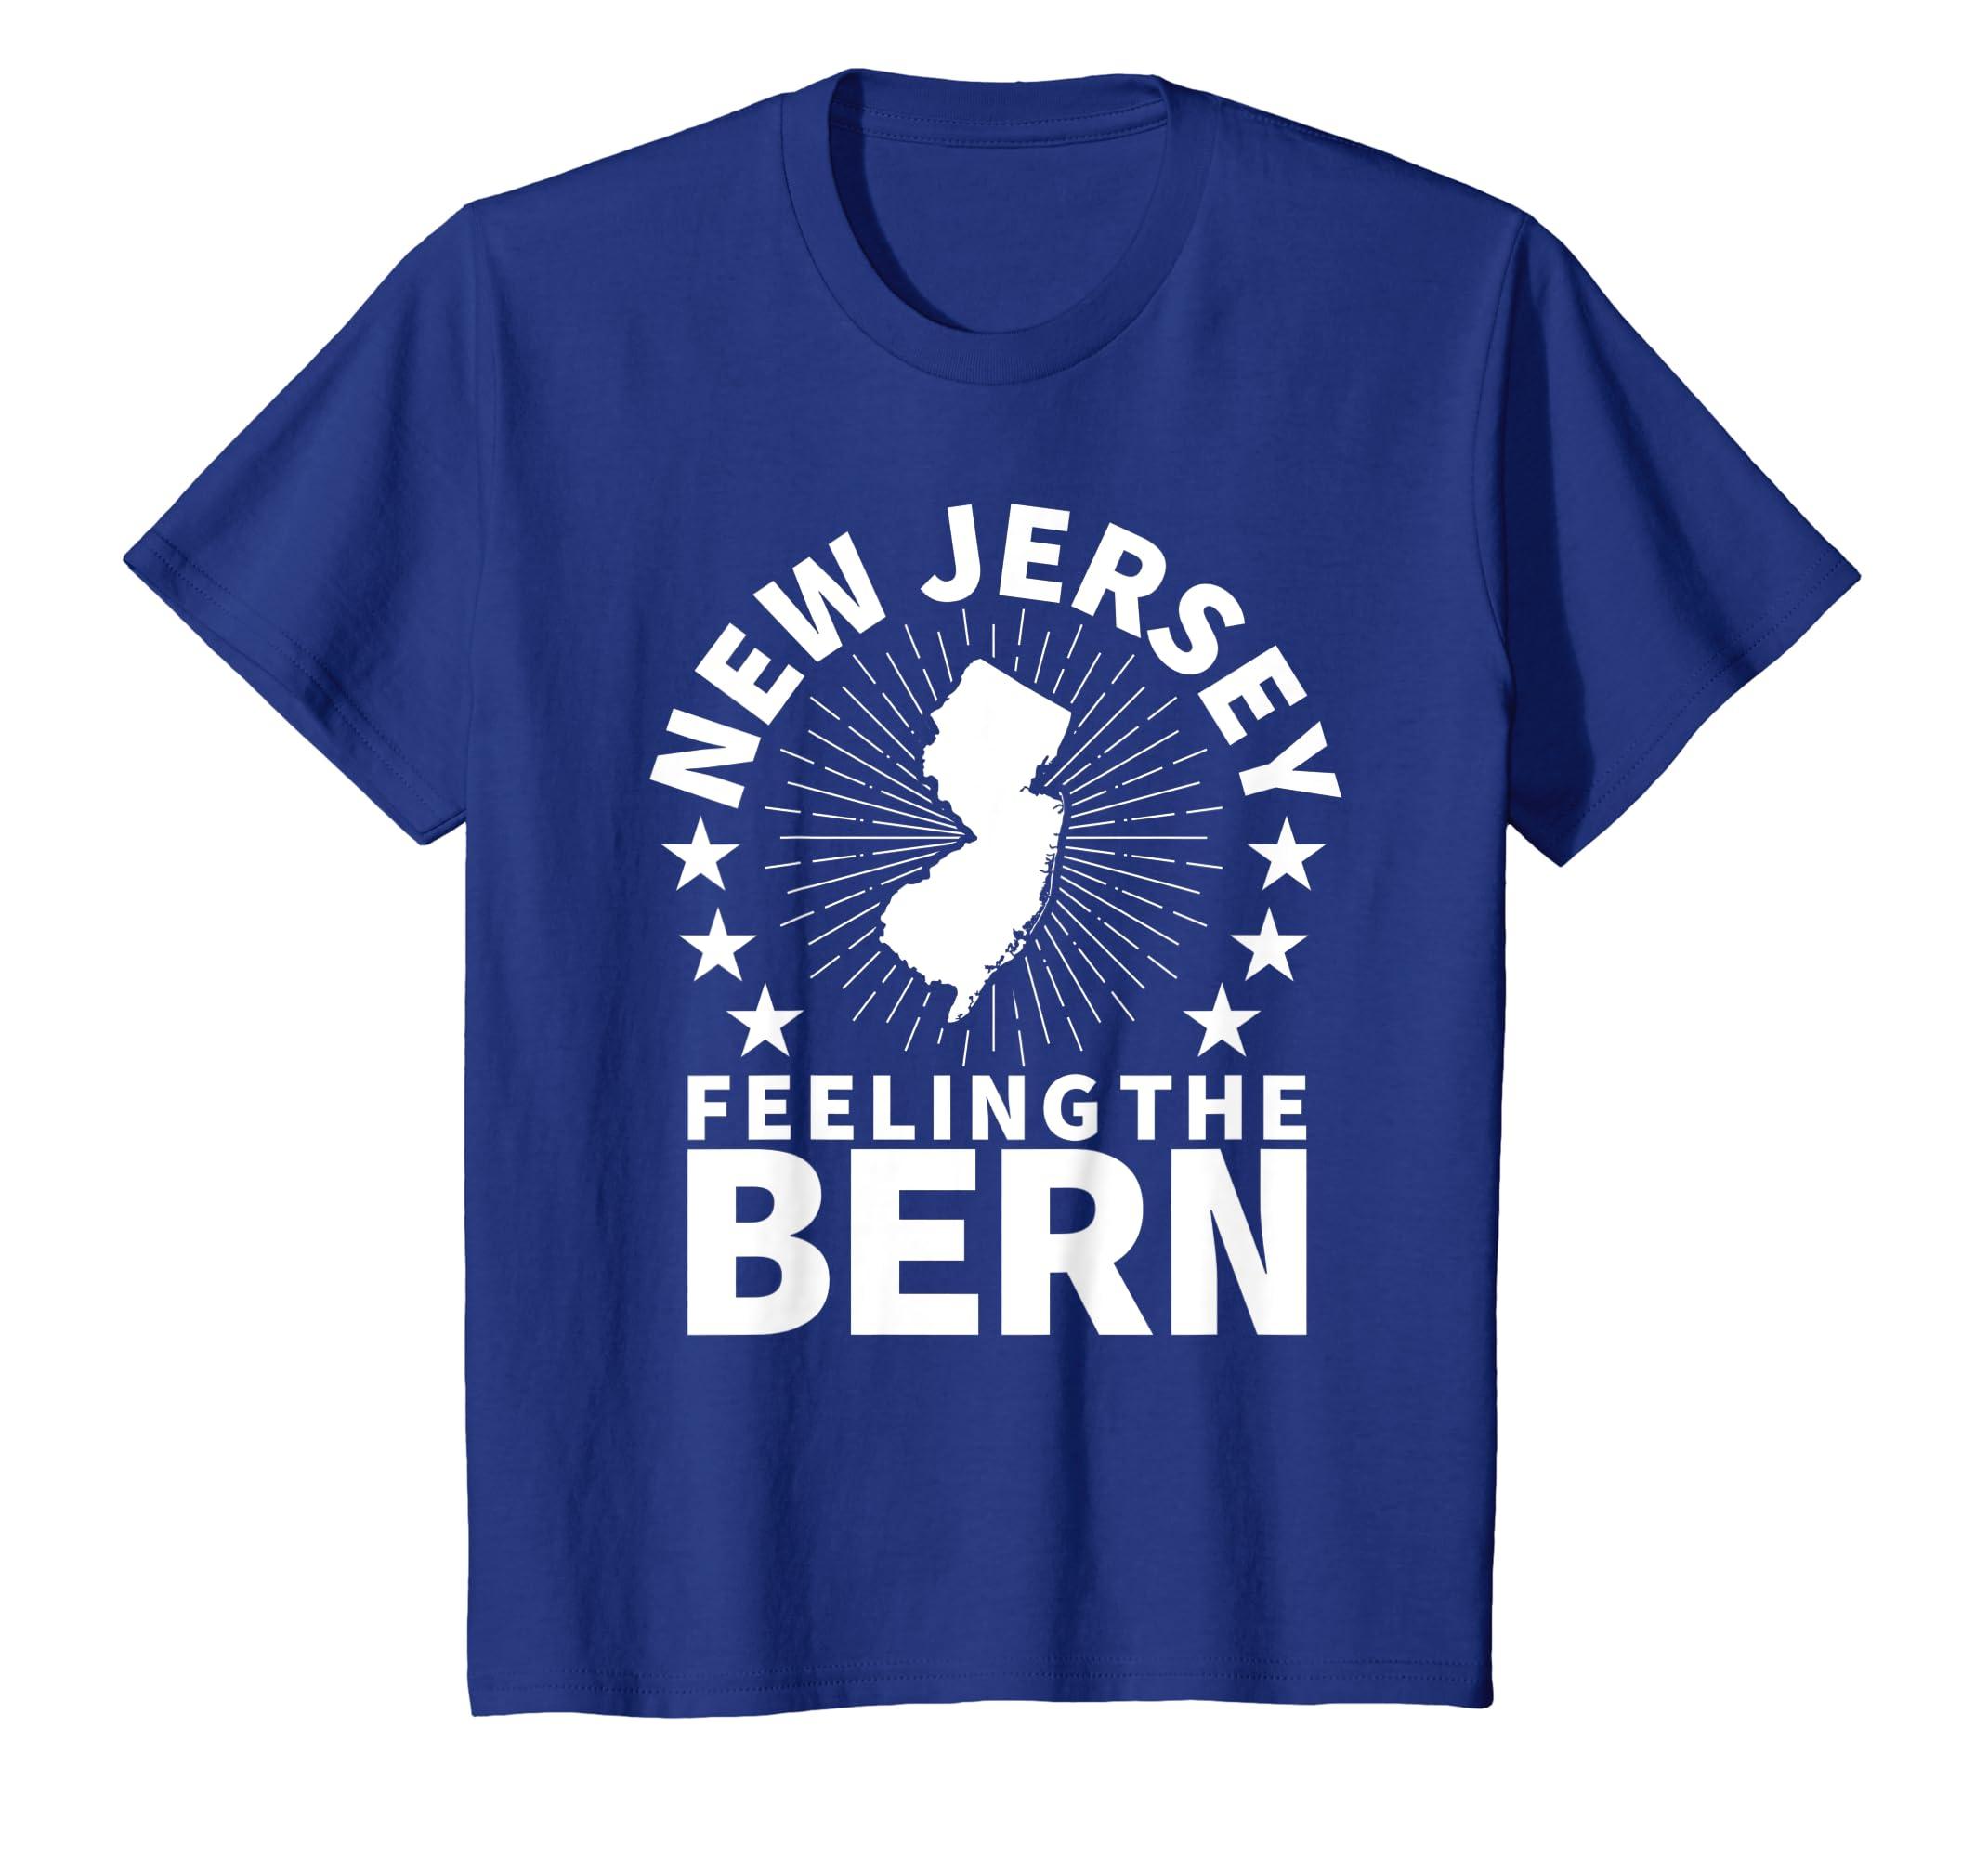 New Jersey Elections 2020.Amazon Com New Jersey Bernie Sanders T Shirt Feel The Bern